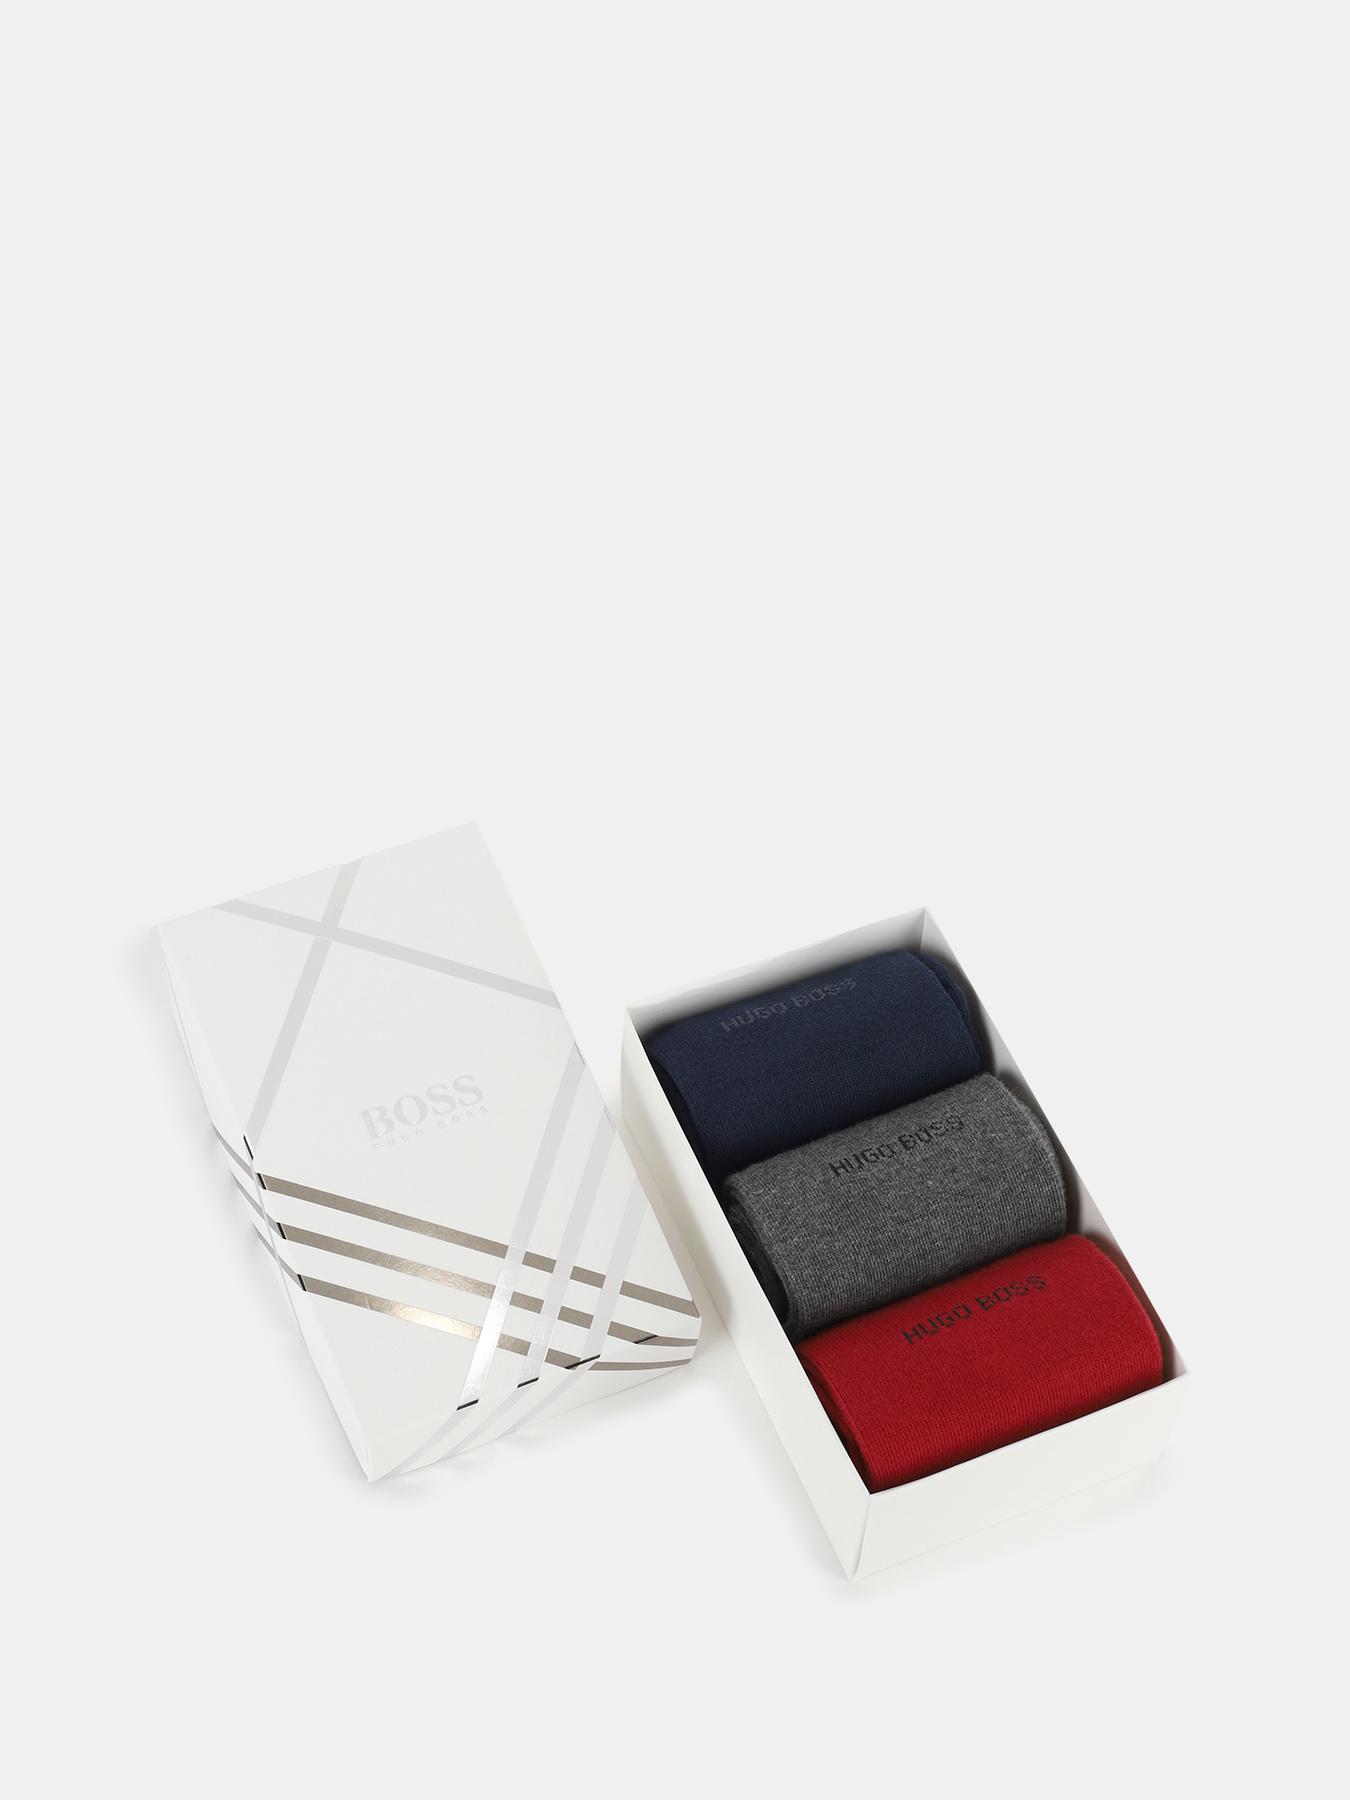 Носки BOSS Носки Gift UniCC (3 шт)